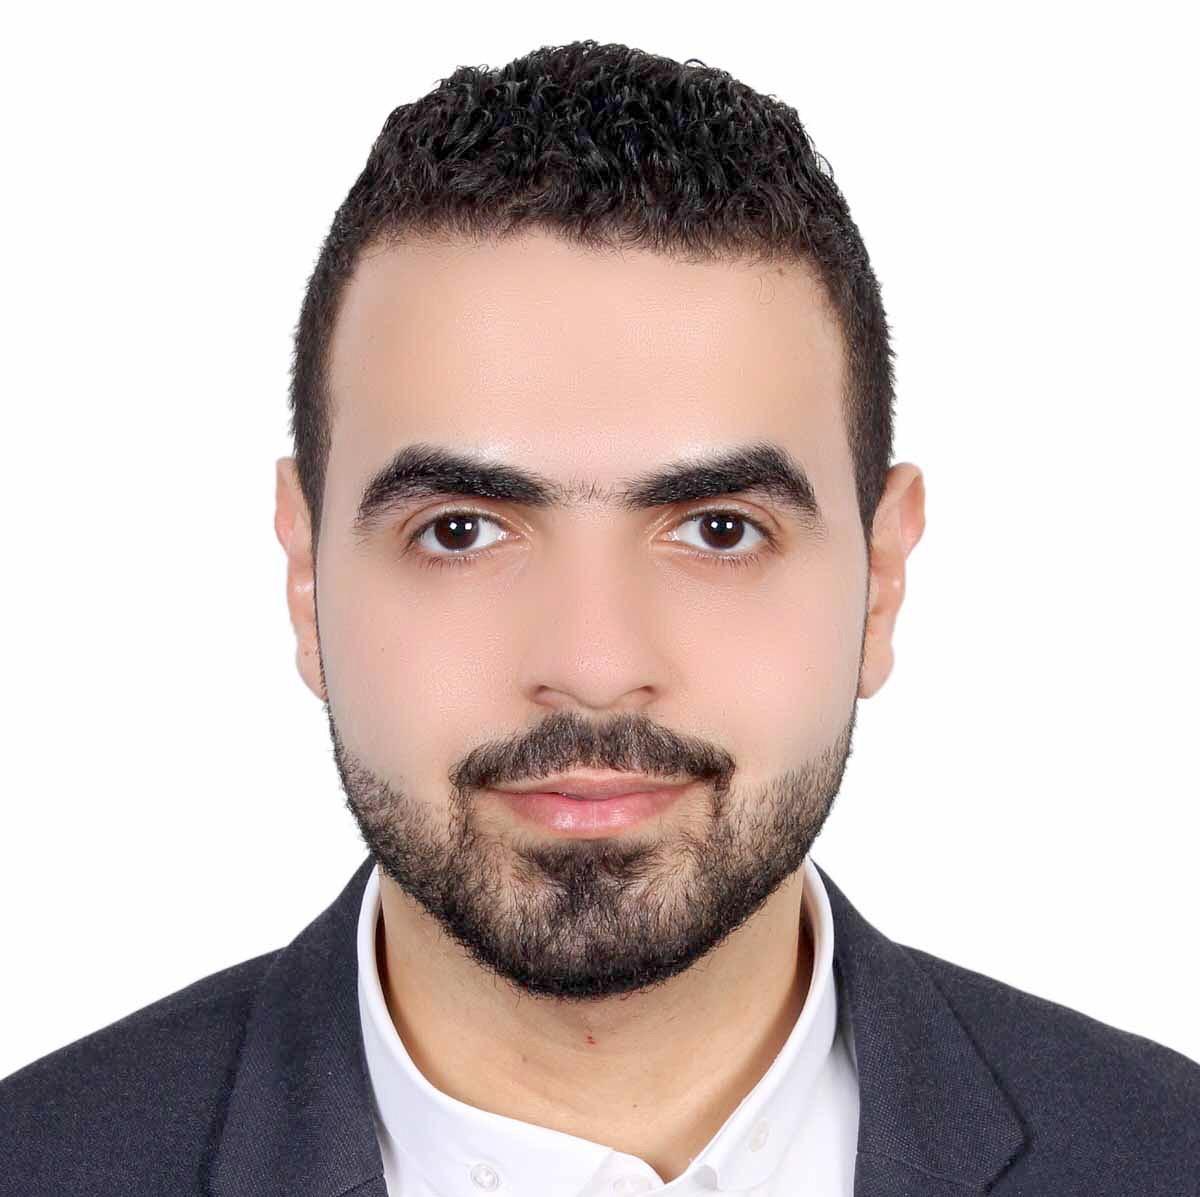 MustafaShaarawy Profile Picture